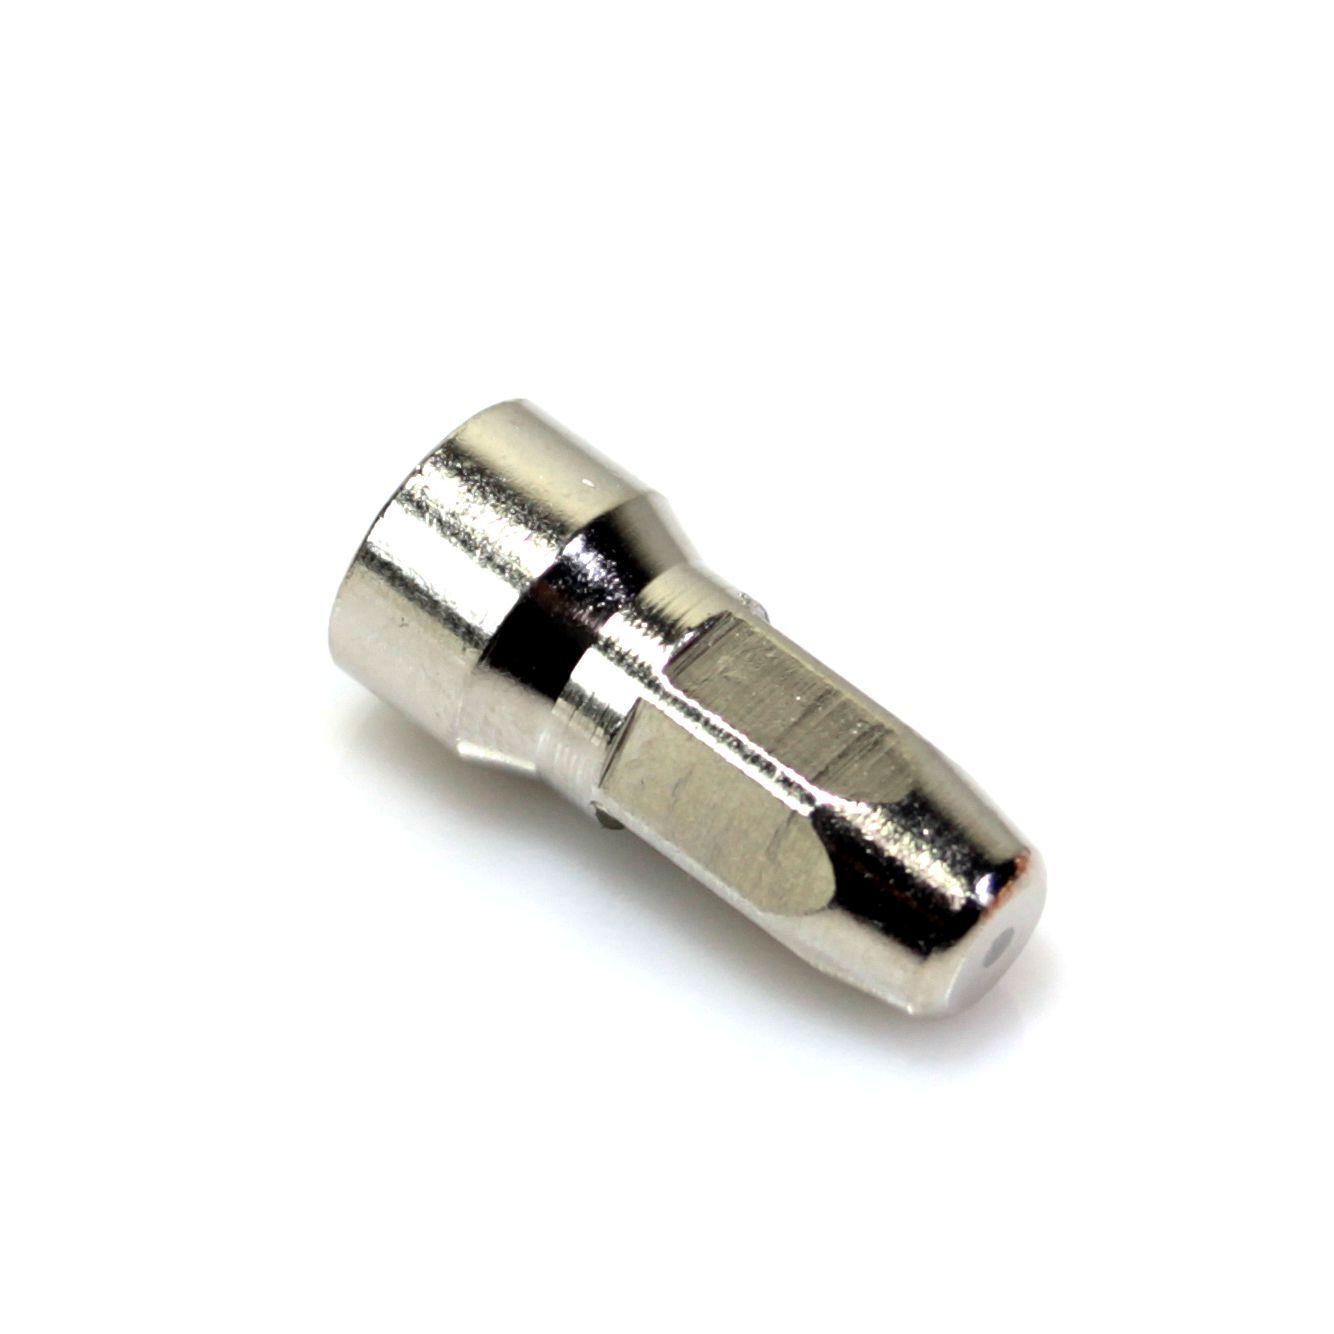 10 x Trafimet S75 Plasma Electrode Consumables PR0117 *FAST US SHIP*